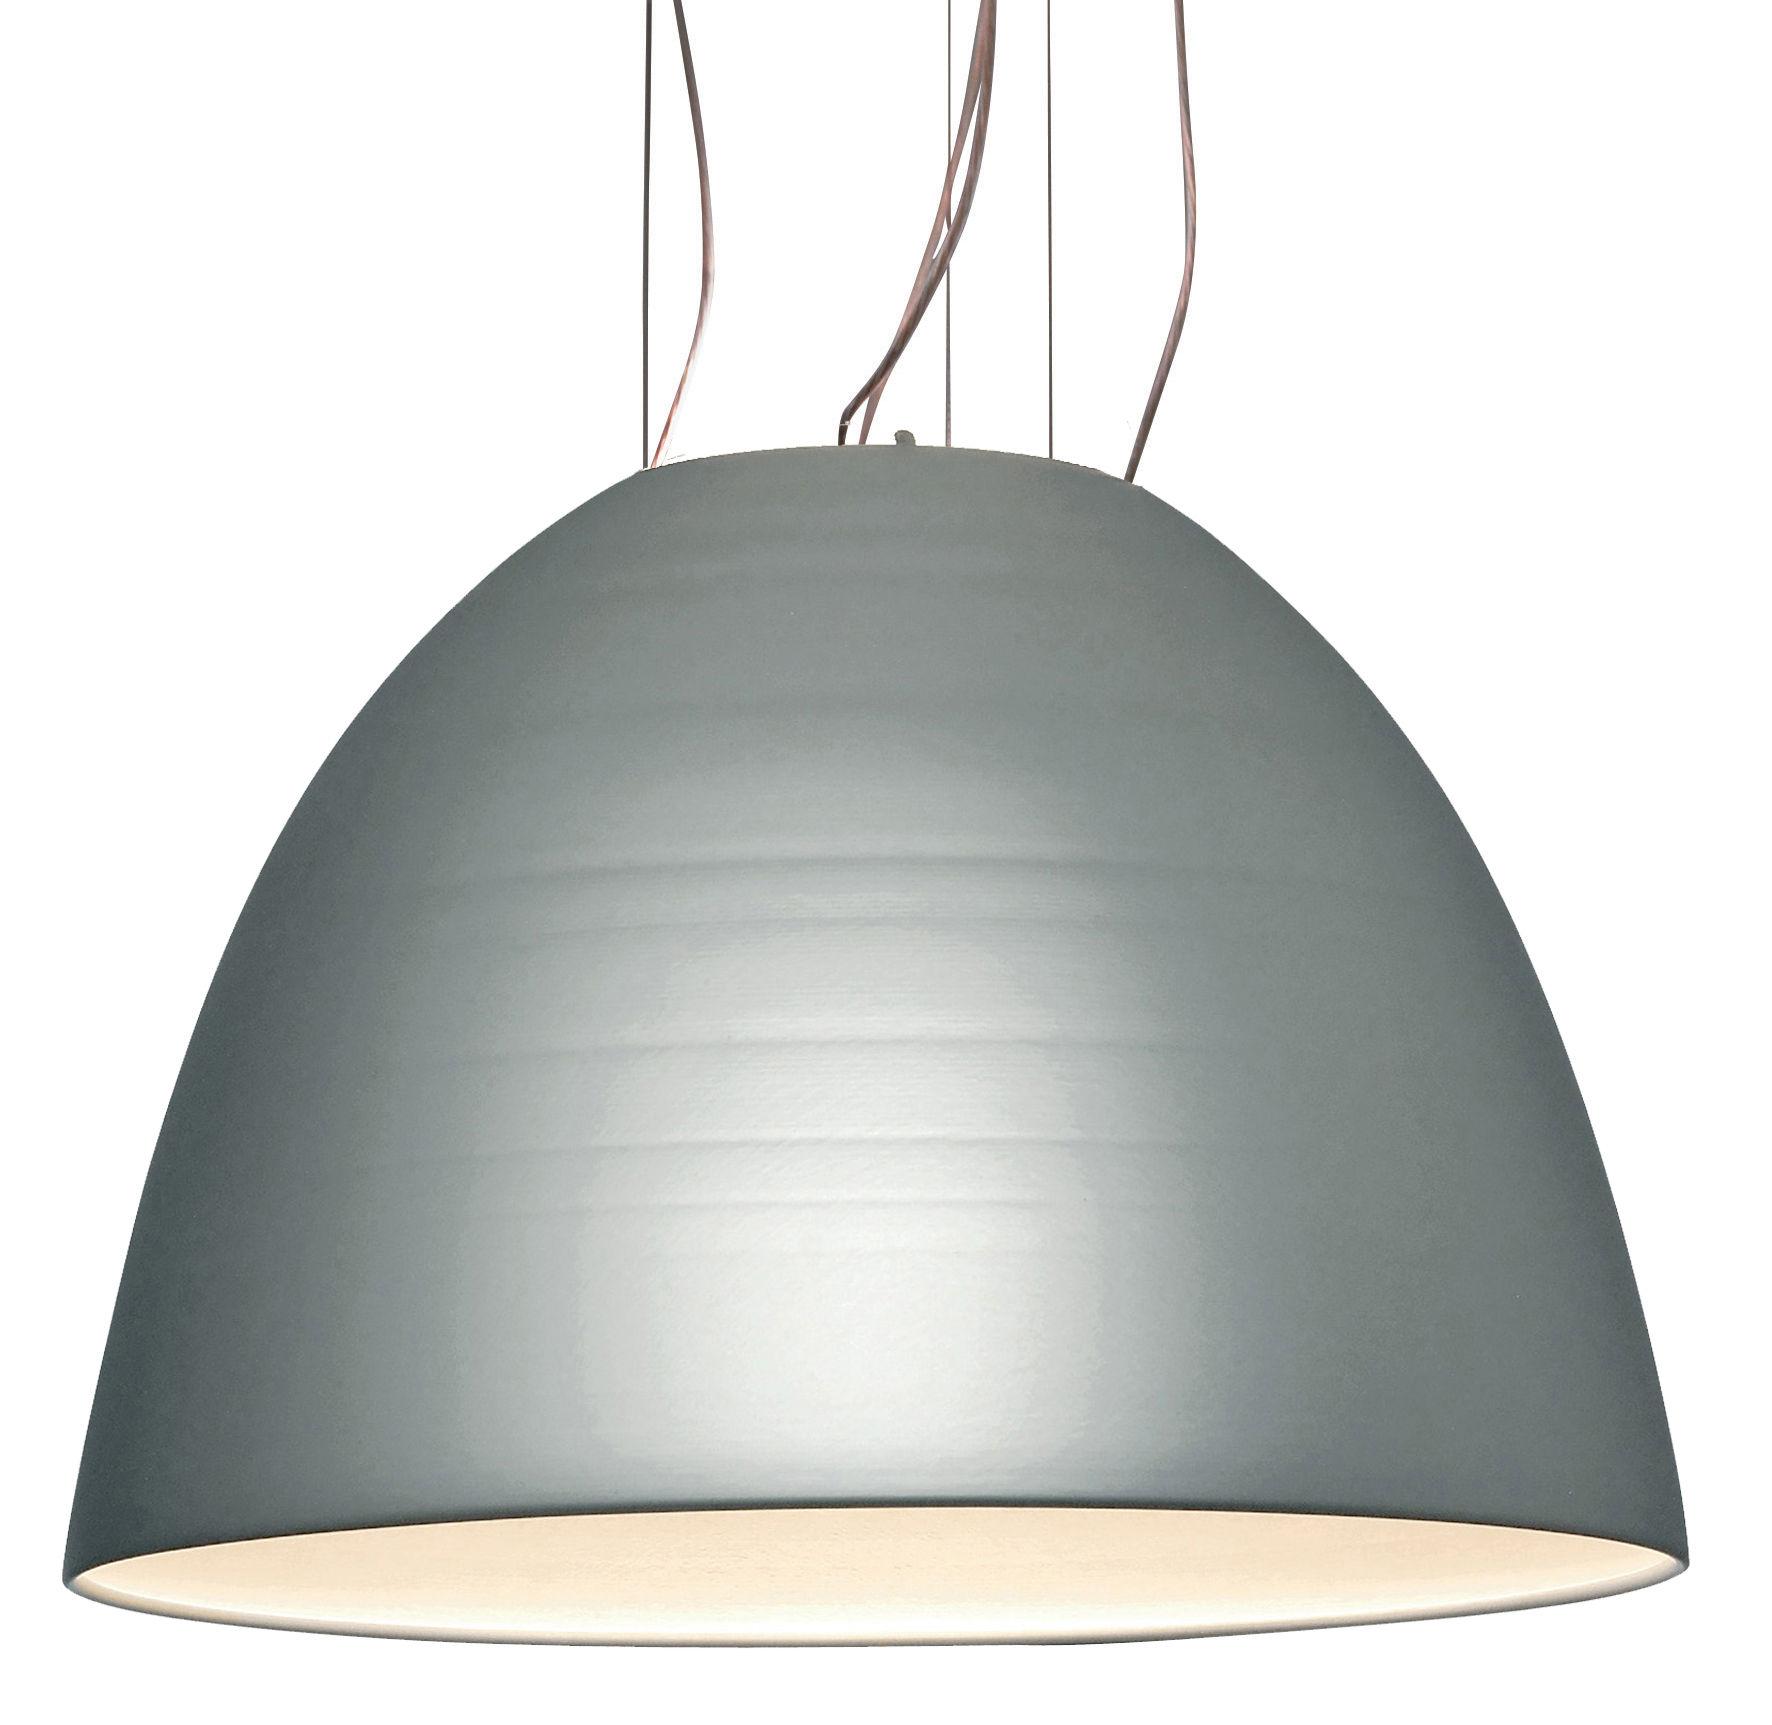 Leuchten - Pendelleuchten - Nur 1618 Pendelleuchte - Artemide - Eloxiertes Aluminium - Halogen - Aluminium